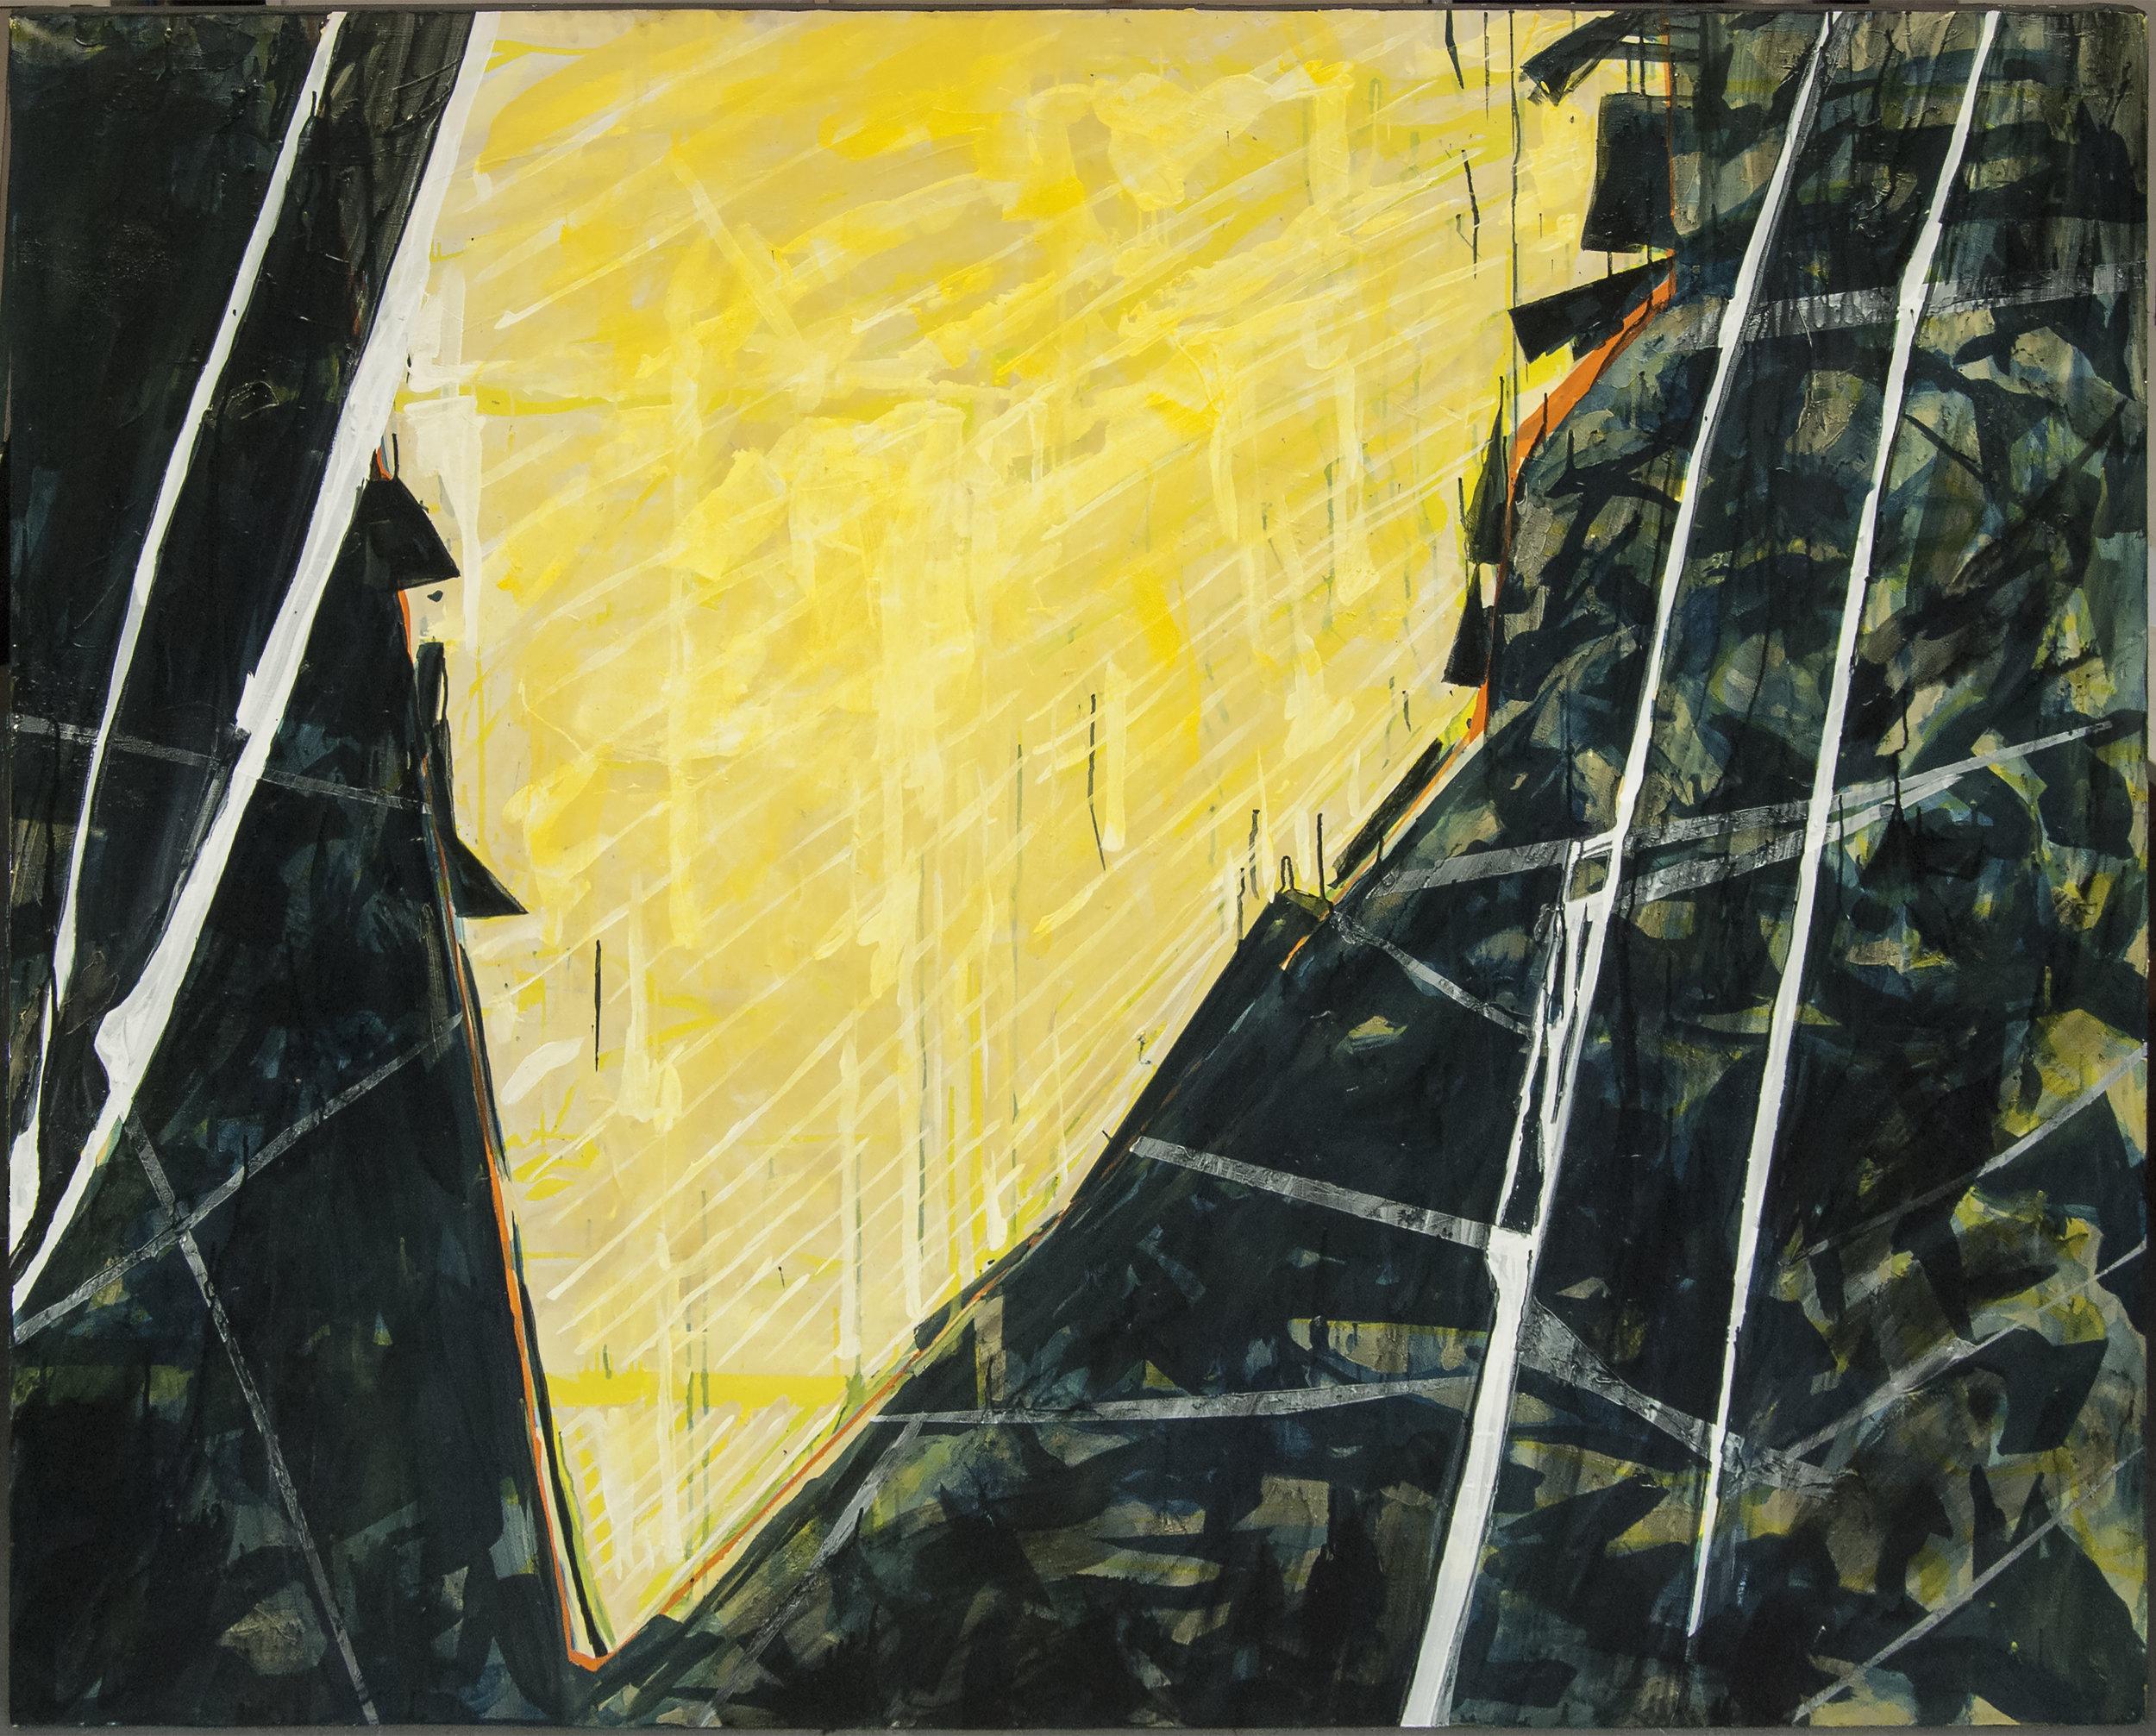 Pendent 3, Acrylic, 2015, (unique work), 200 x 161 cm